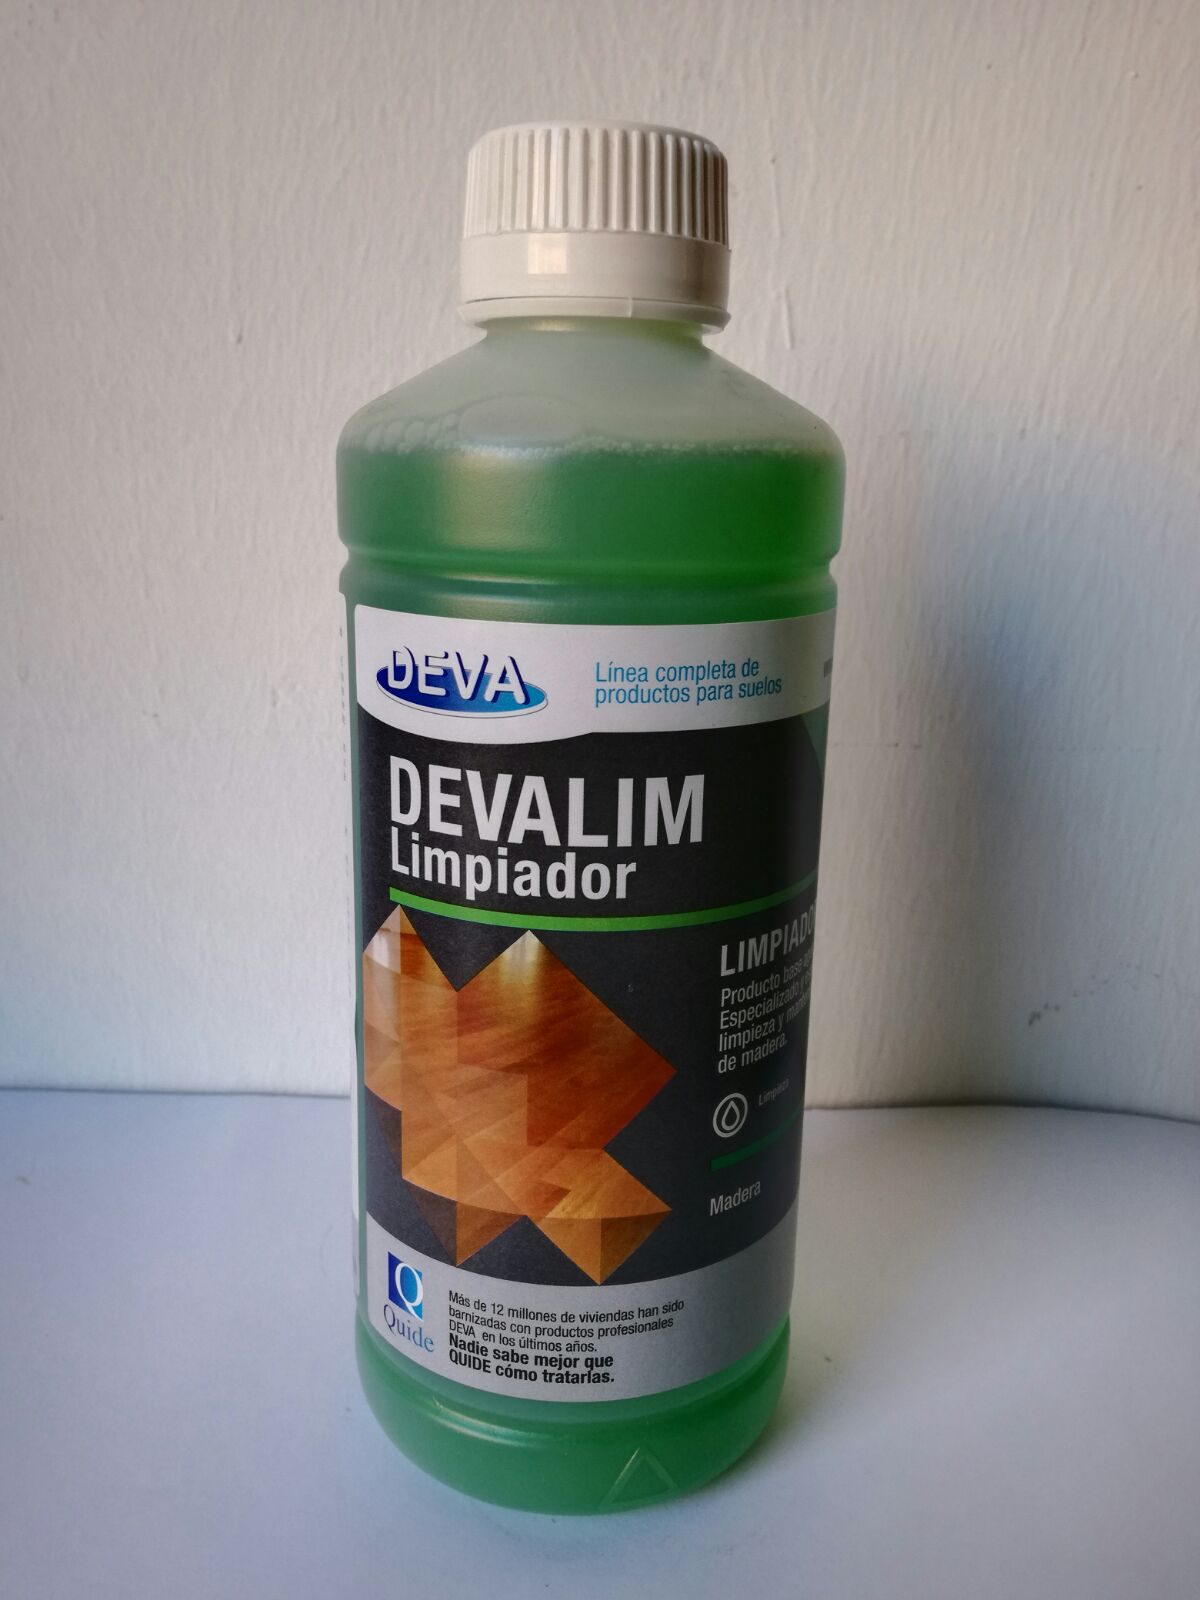 Productos para limpiar madera latest productos para limpiar madera with productos para limpiar - Productos para parquet ...